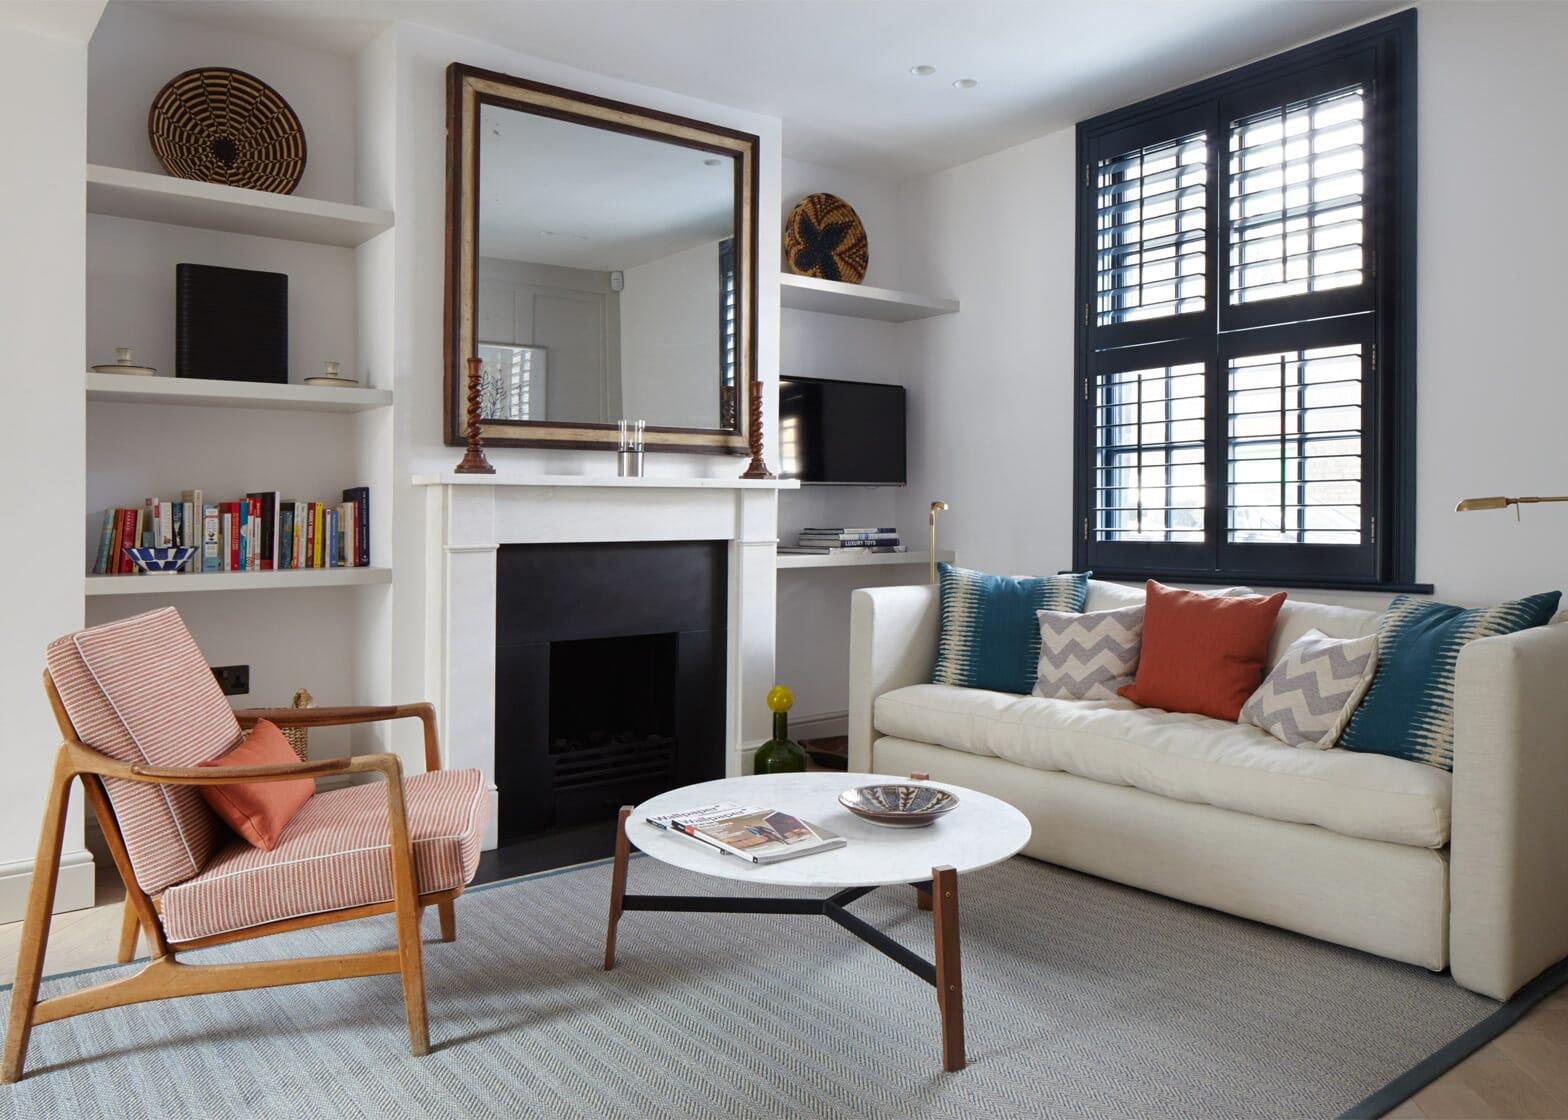 lambeth-marsh-house-fraher-architects-residential-renovation-london-uk_dezeen_1568_0